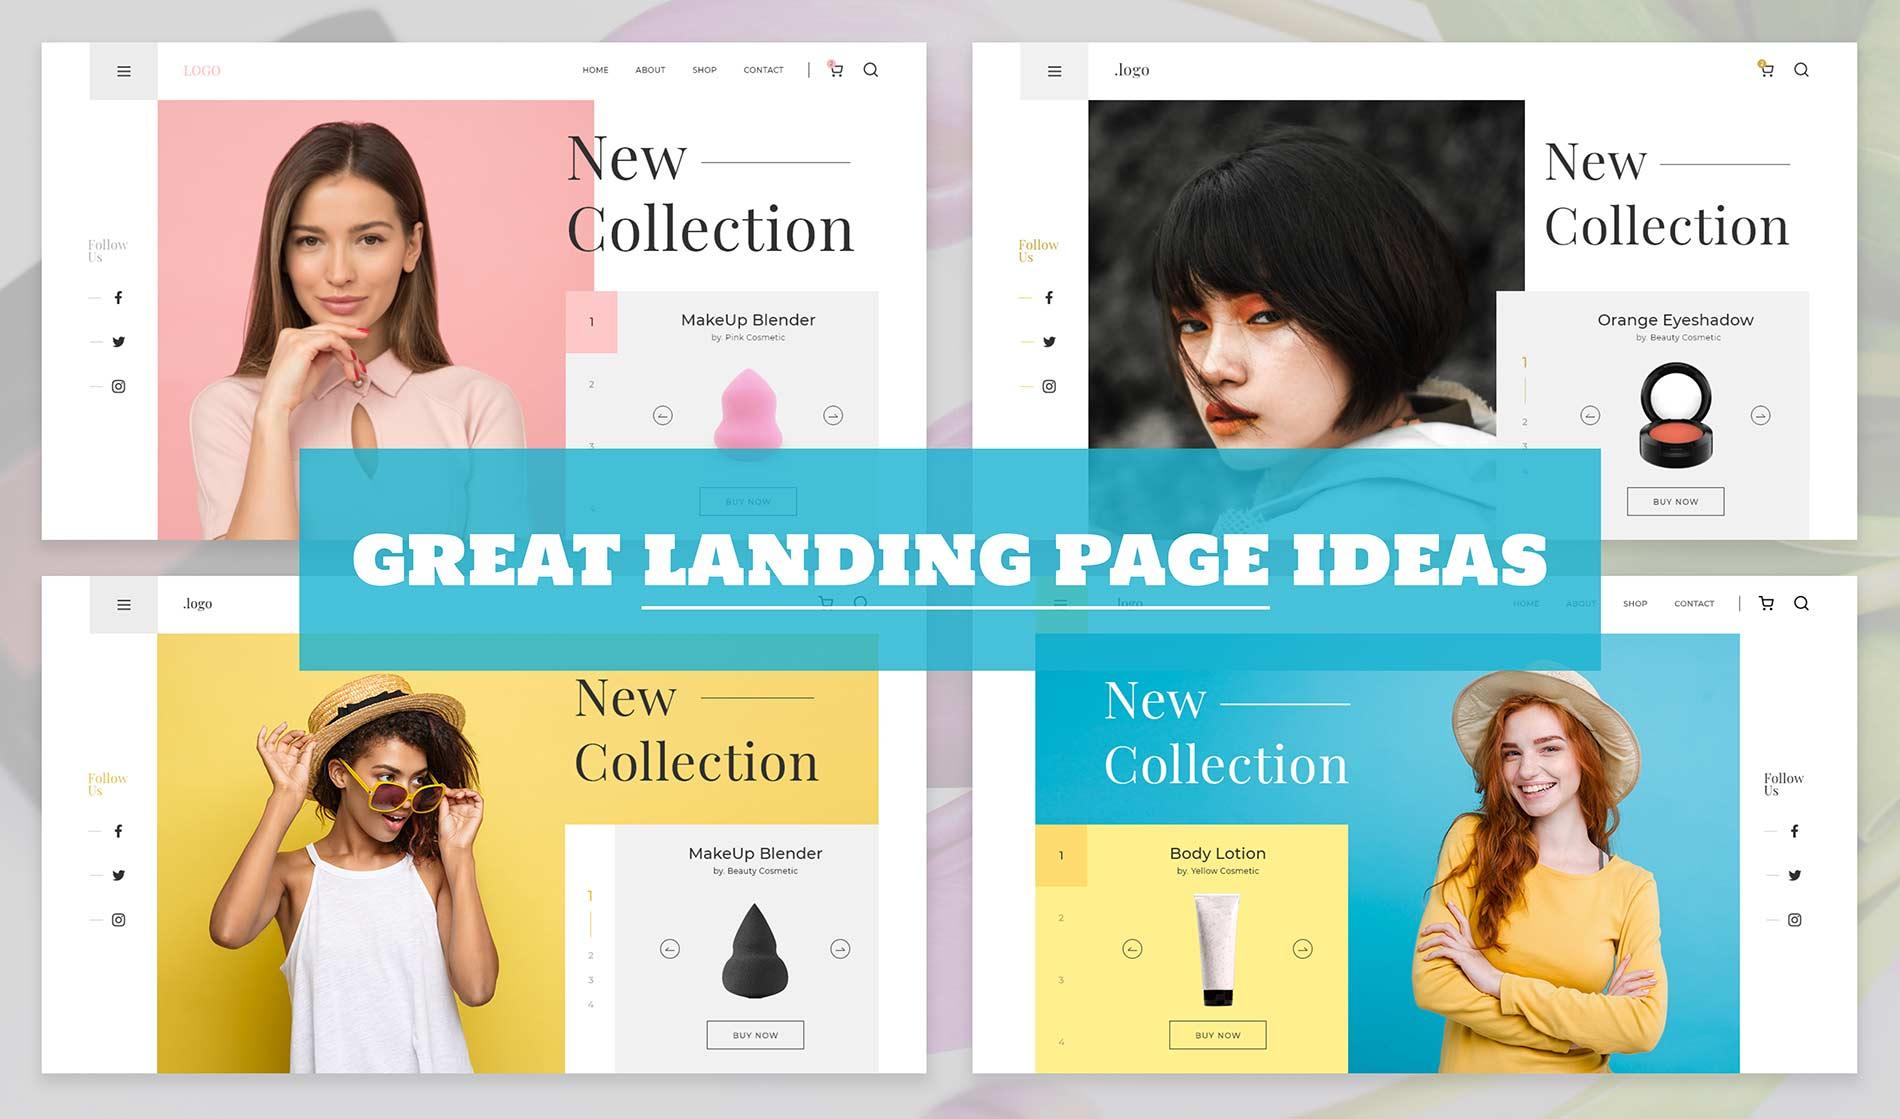 Best landing page design ideas